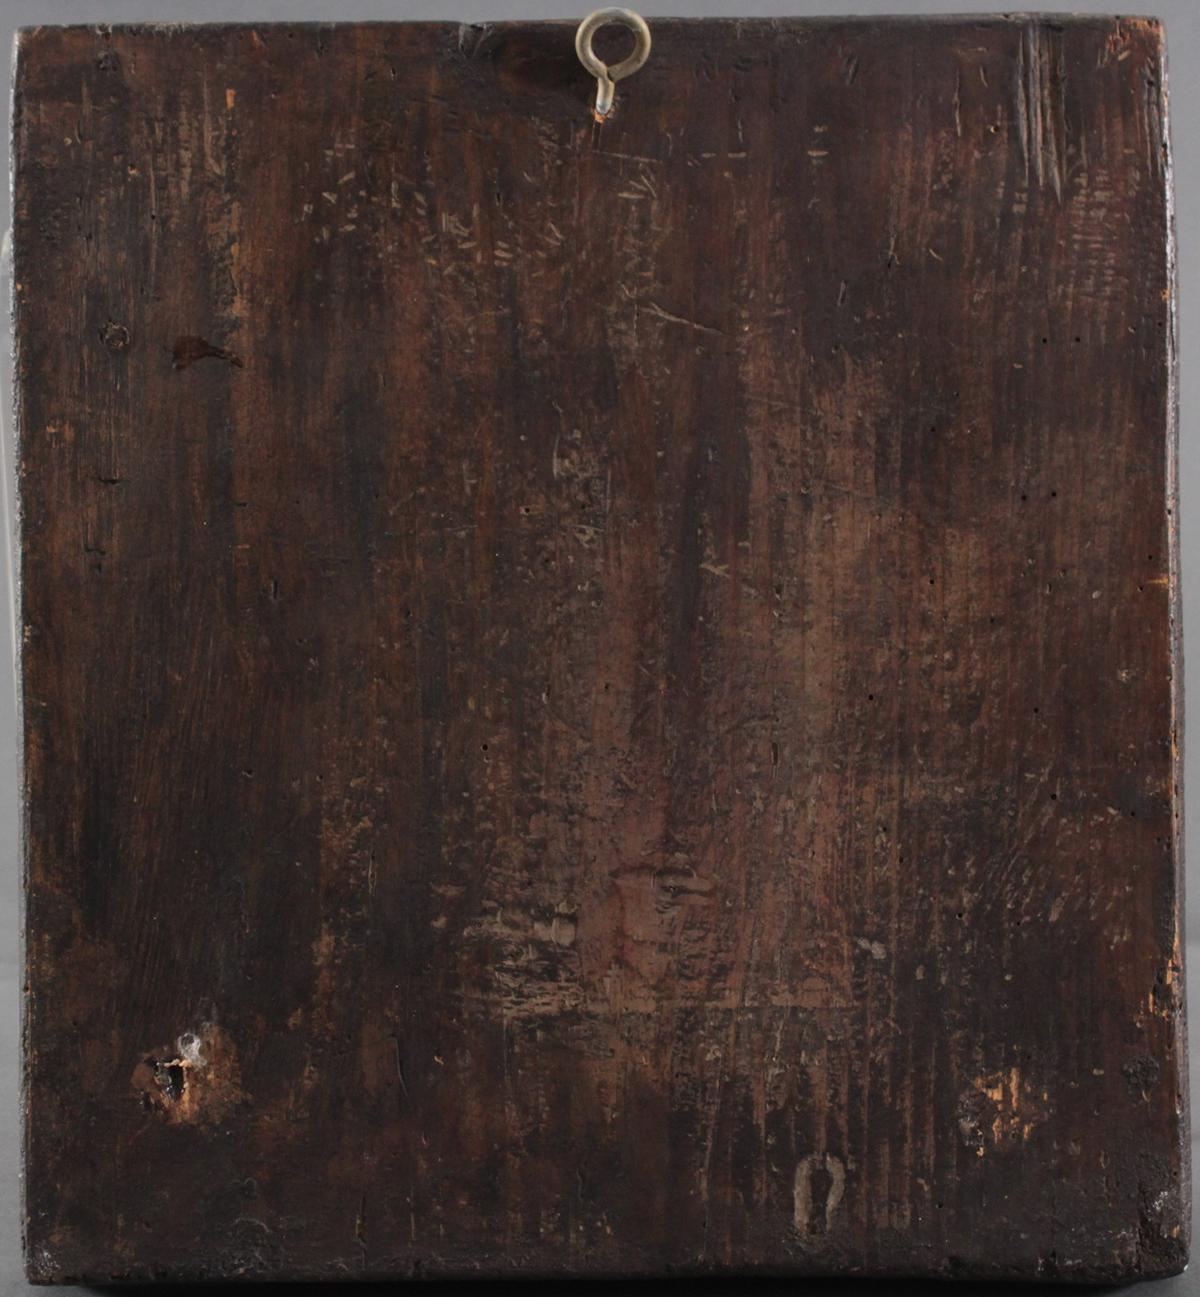 Ikone 'Heiliger Georg der Drachentöter', Russland 18. Jh.-4